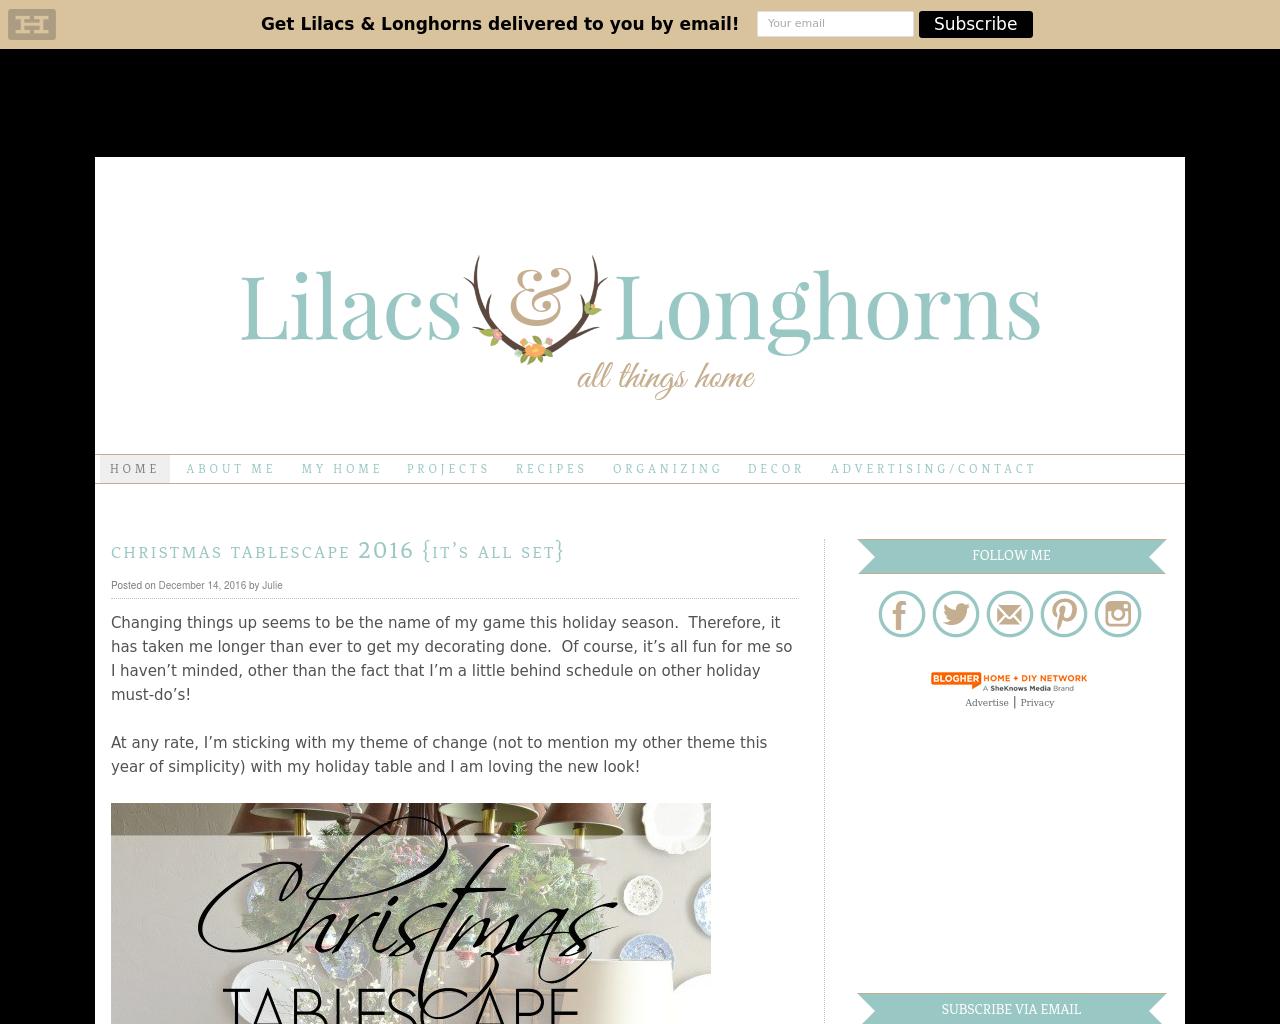 Lilacs-&-Longhorns-Advertising-Reviews-Pricing